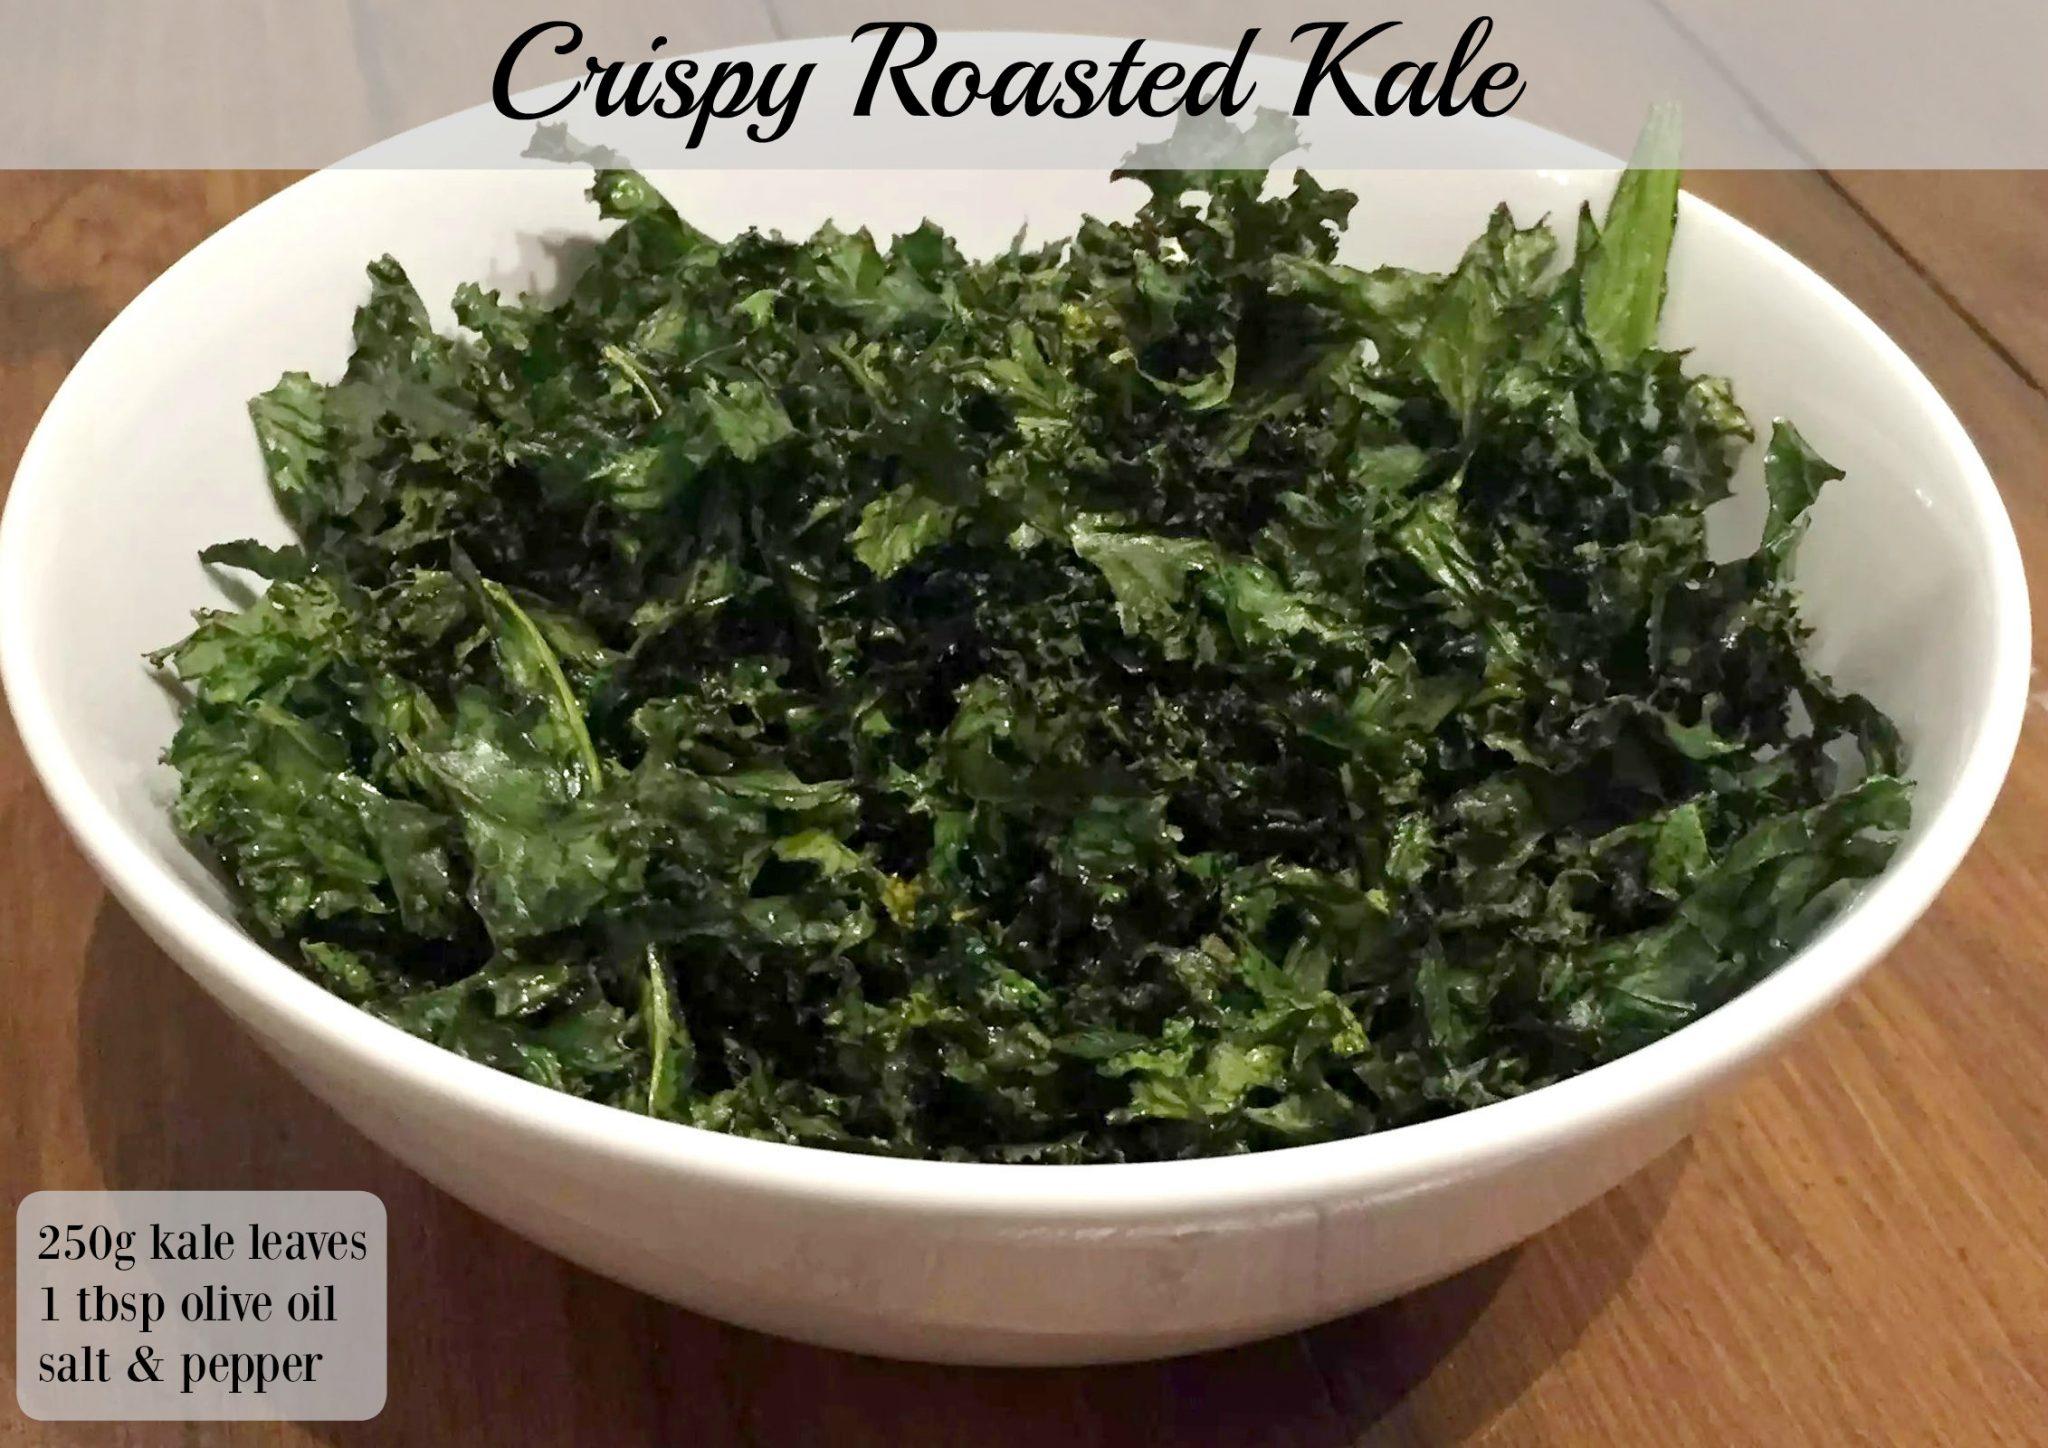 Crispy Roasted Kale by Emma Eats & Explores - SCD, Paleo, Vegan, Vegetarian, Glutenfree, Grainfree, Sugarfree, Dairyfree